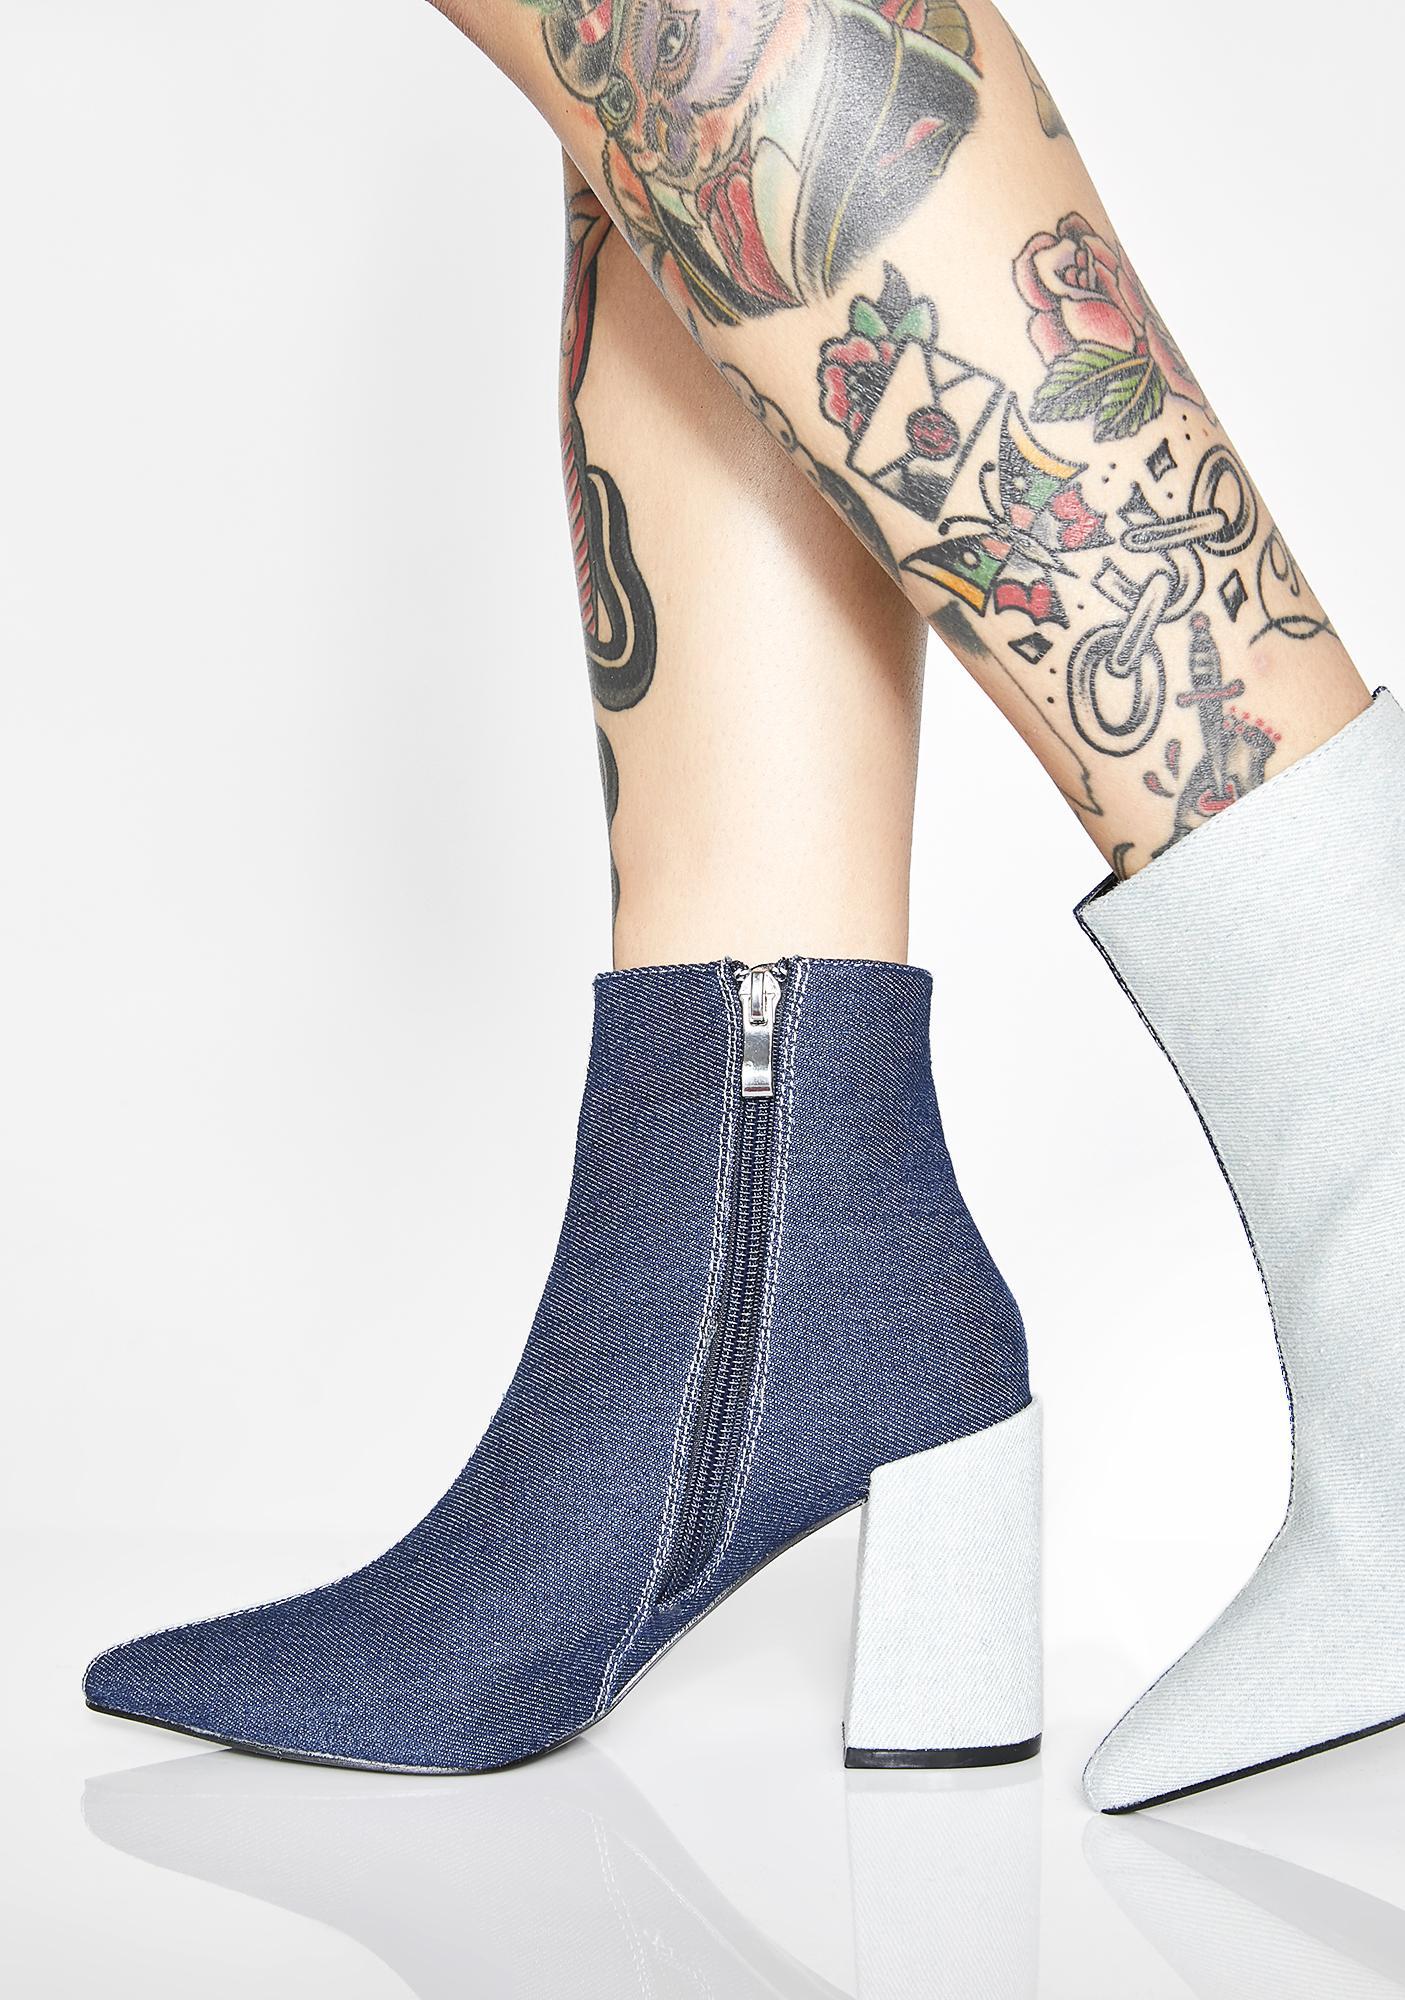 Denim Go Both Ways Ankle Boots